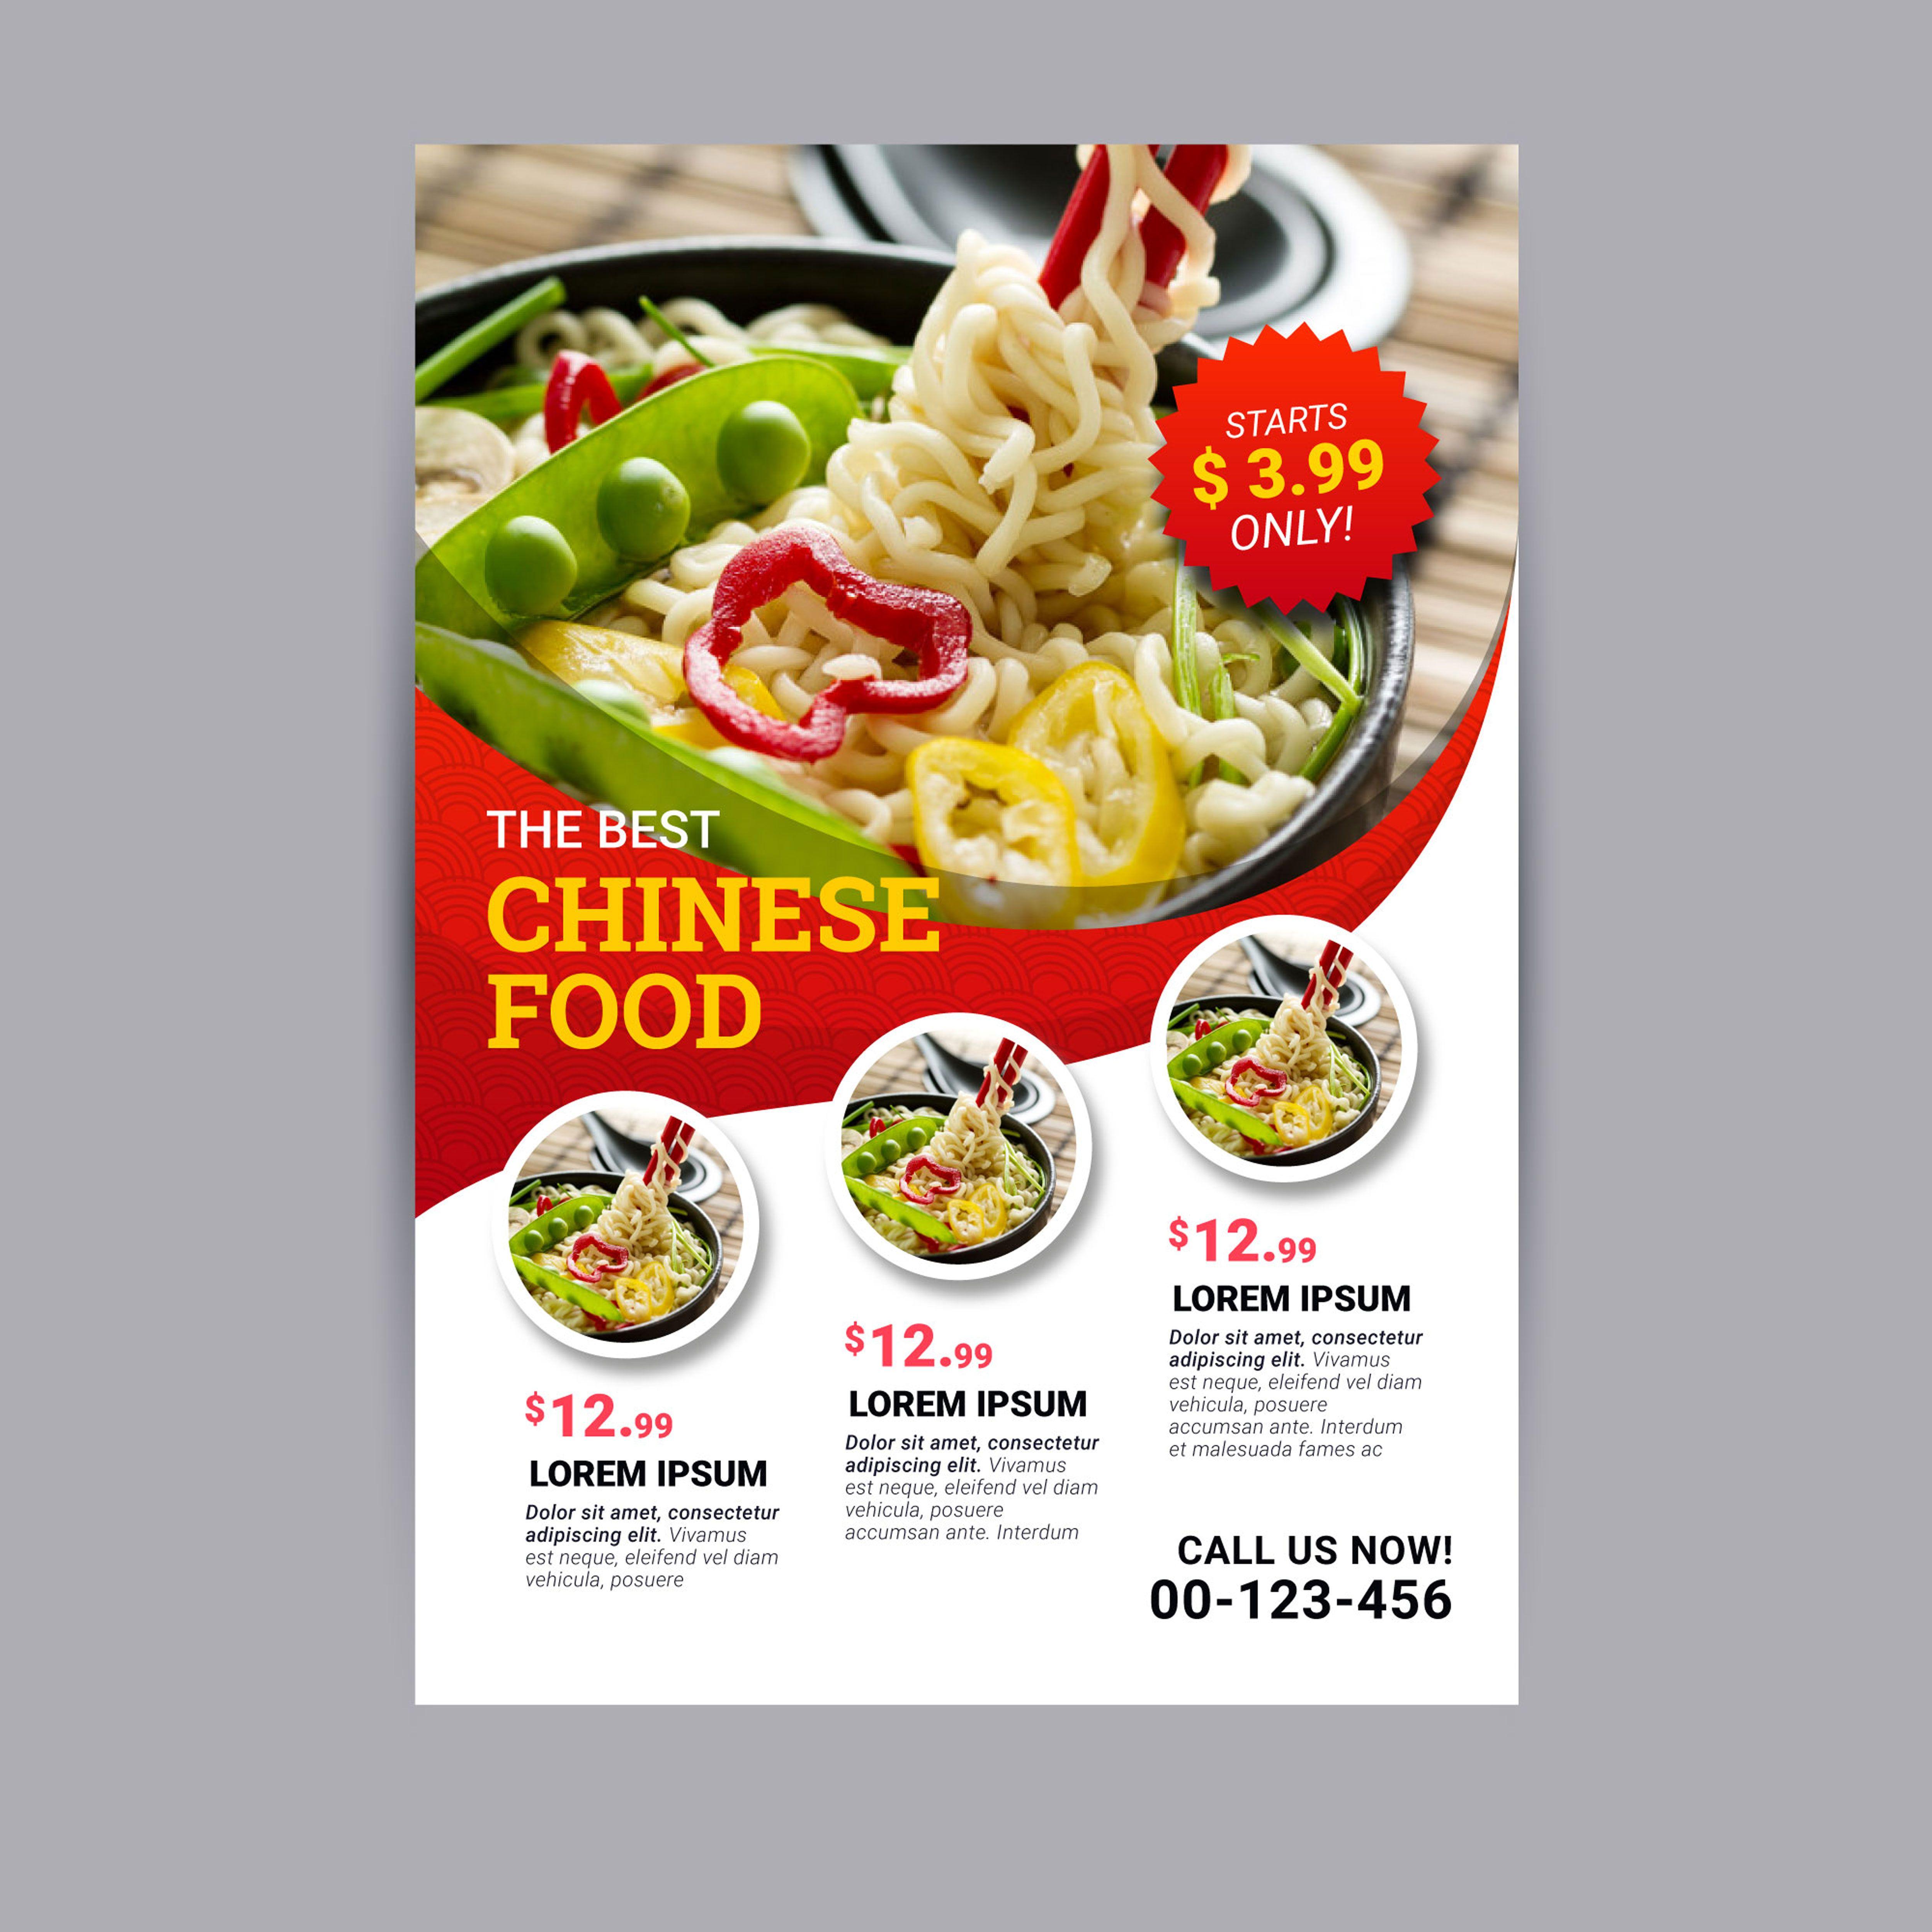 Chinese Food Flyer Kitajskaya Eda Eda Recepty Kitajskoj Kuhni